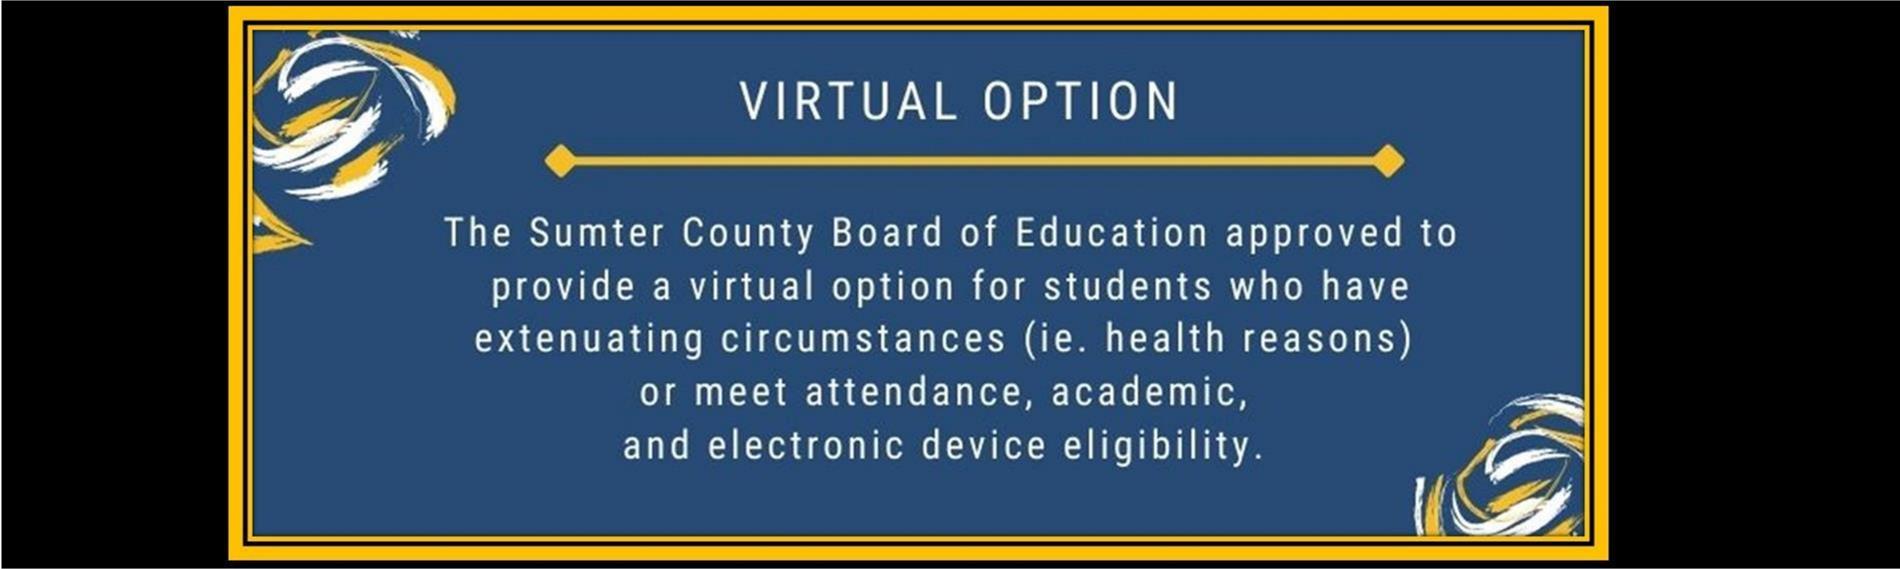 Virtual Options